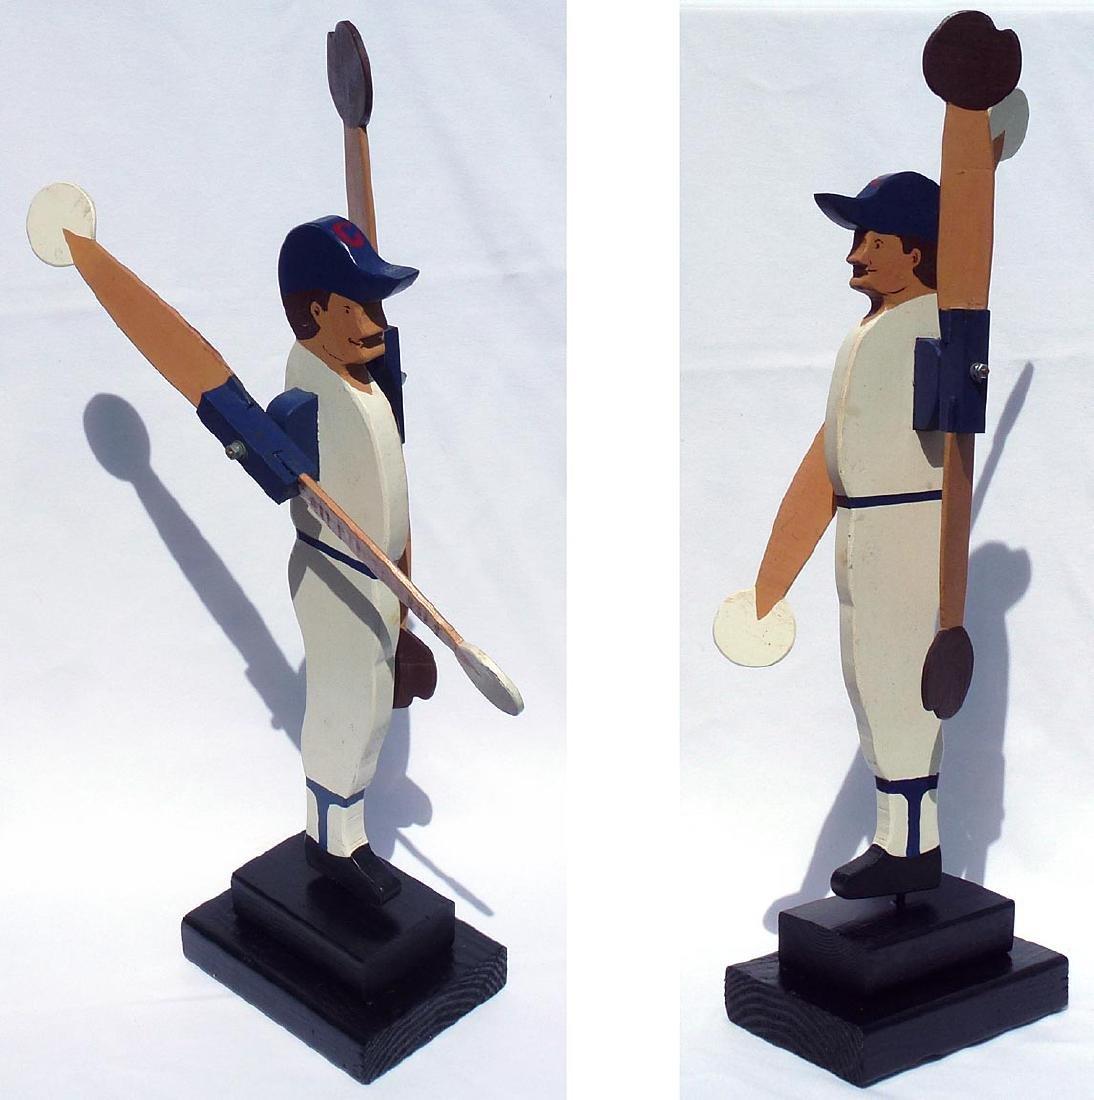 Baseball player whirligig Chicago Cubs #31 - 5